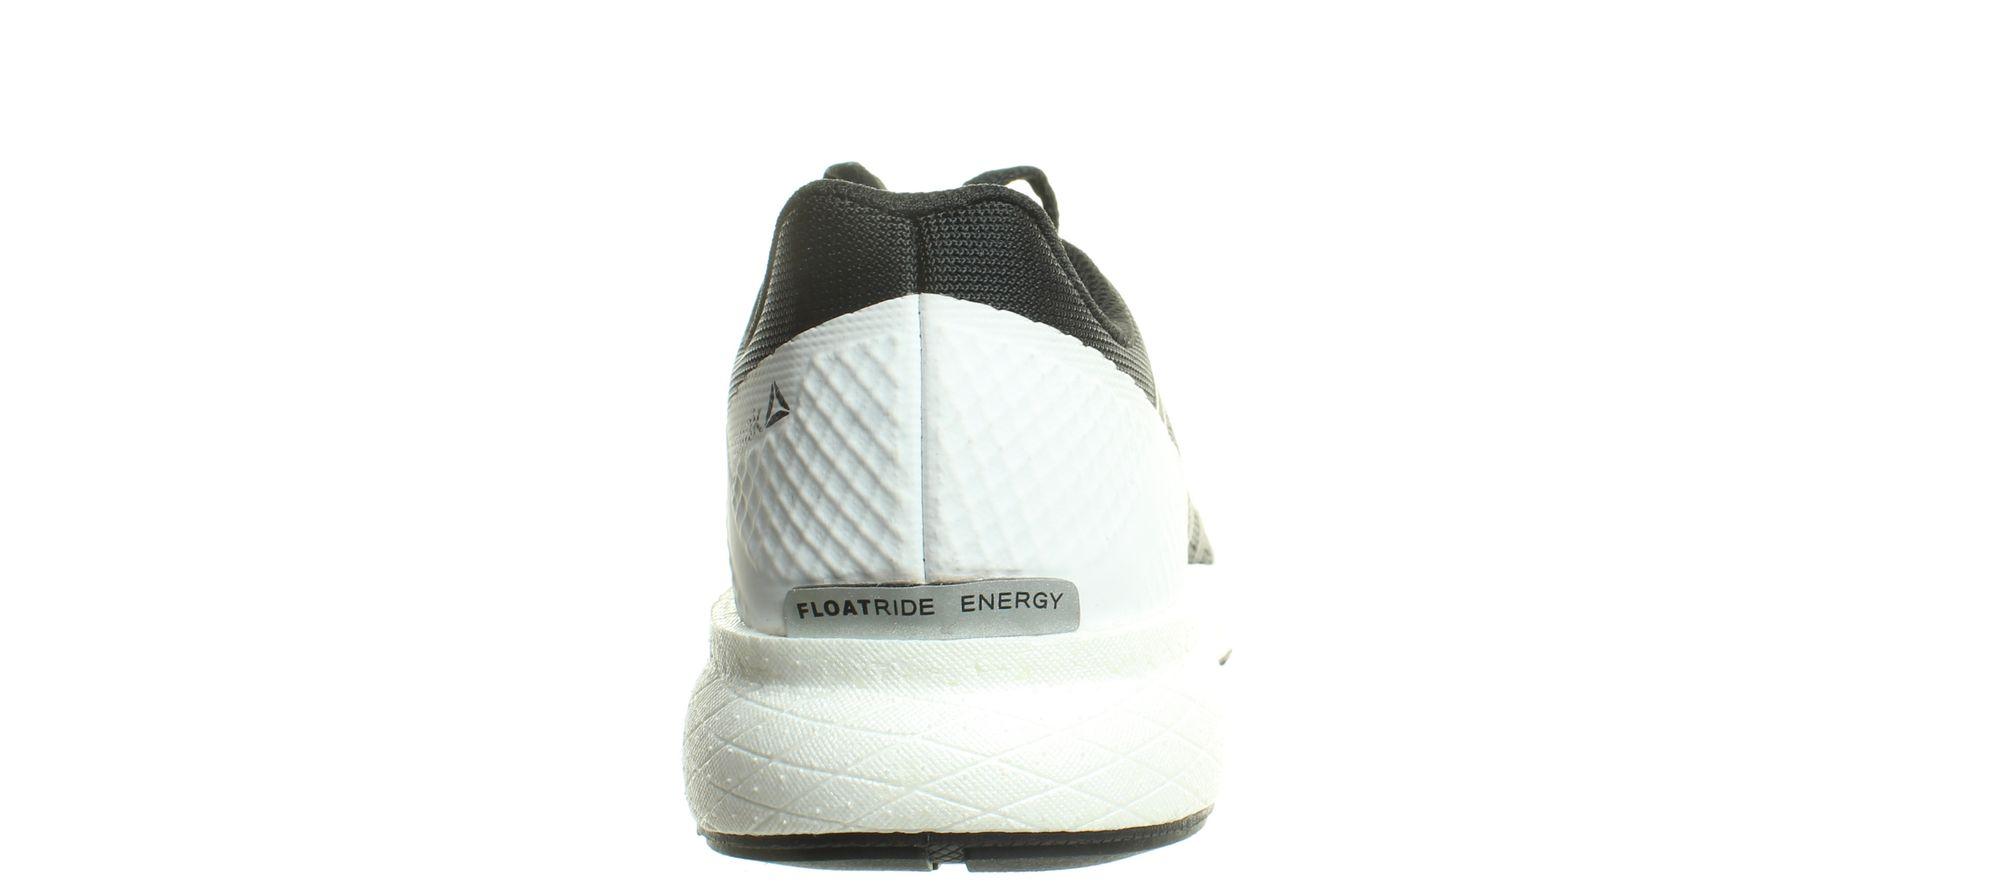 Reebok-Womens-Forever-Floatride-Energy-Running-Shoes thumbnail 12